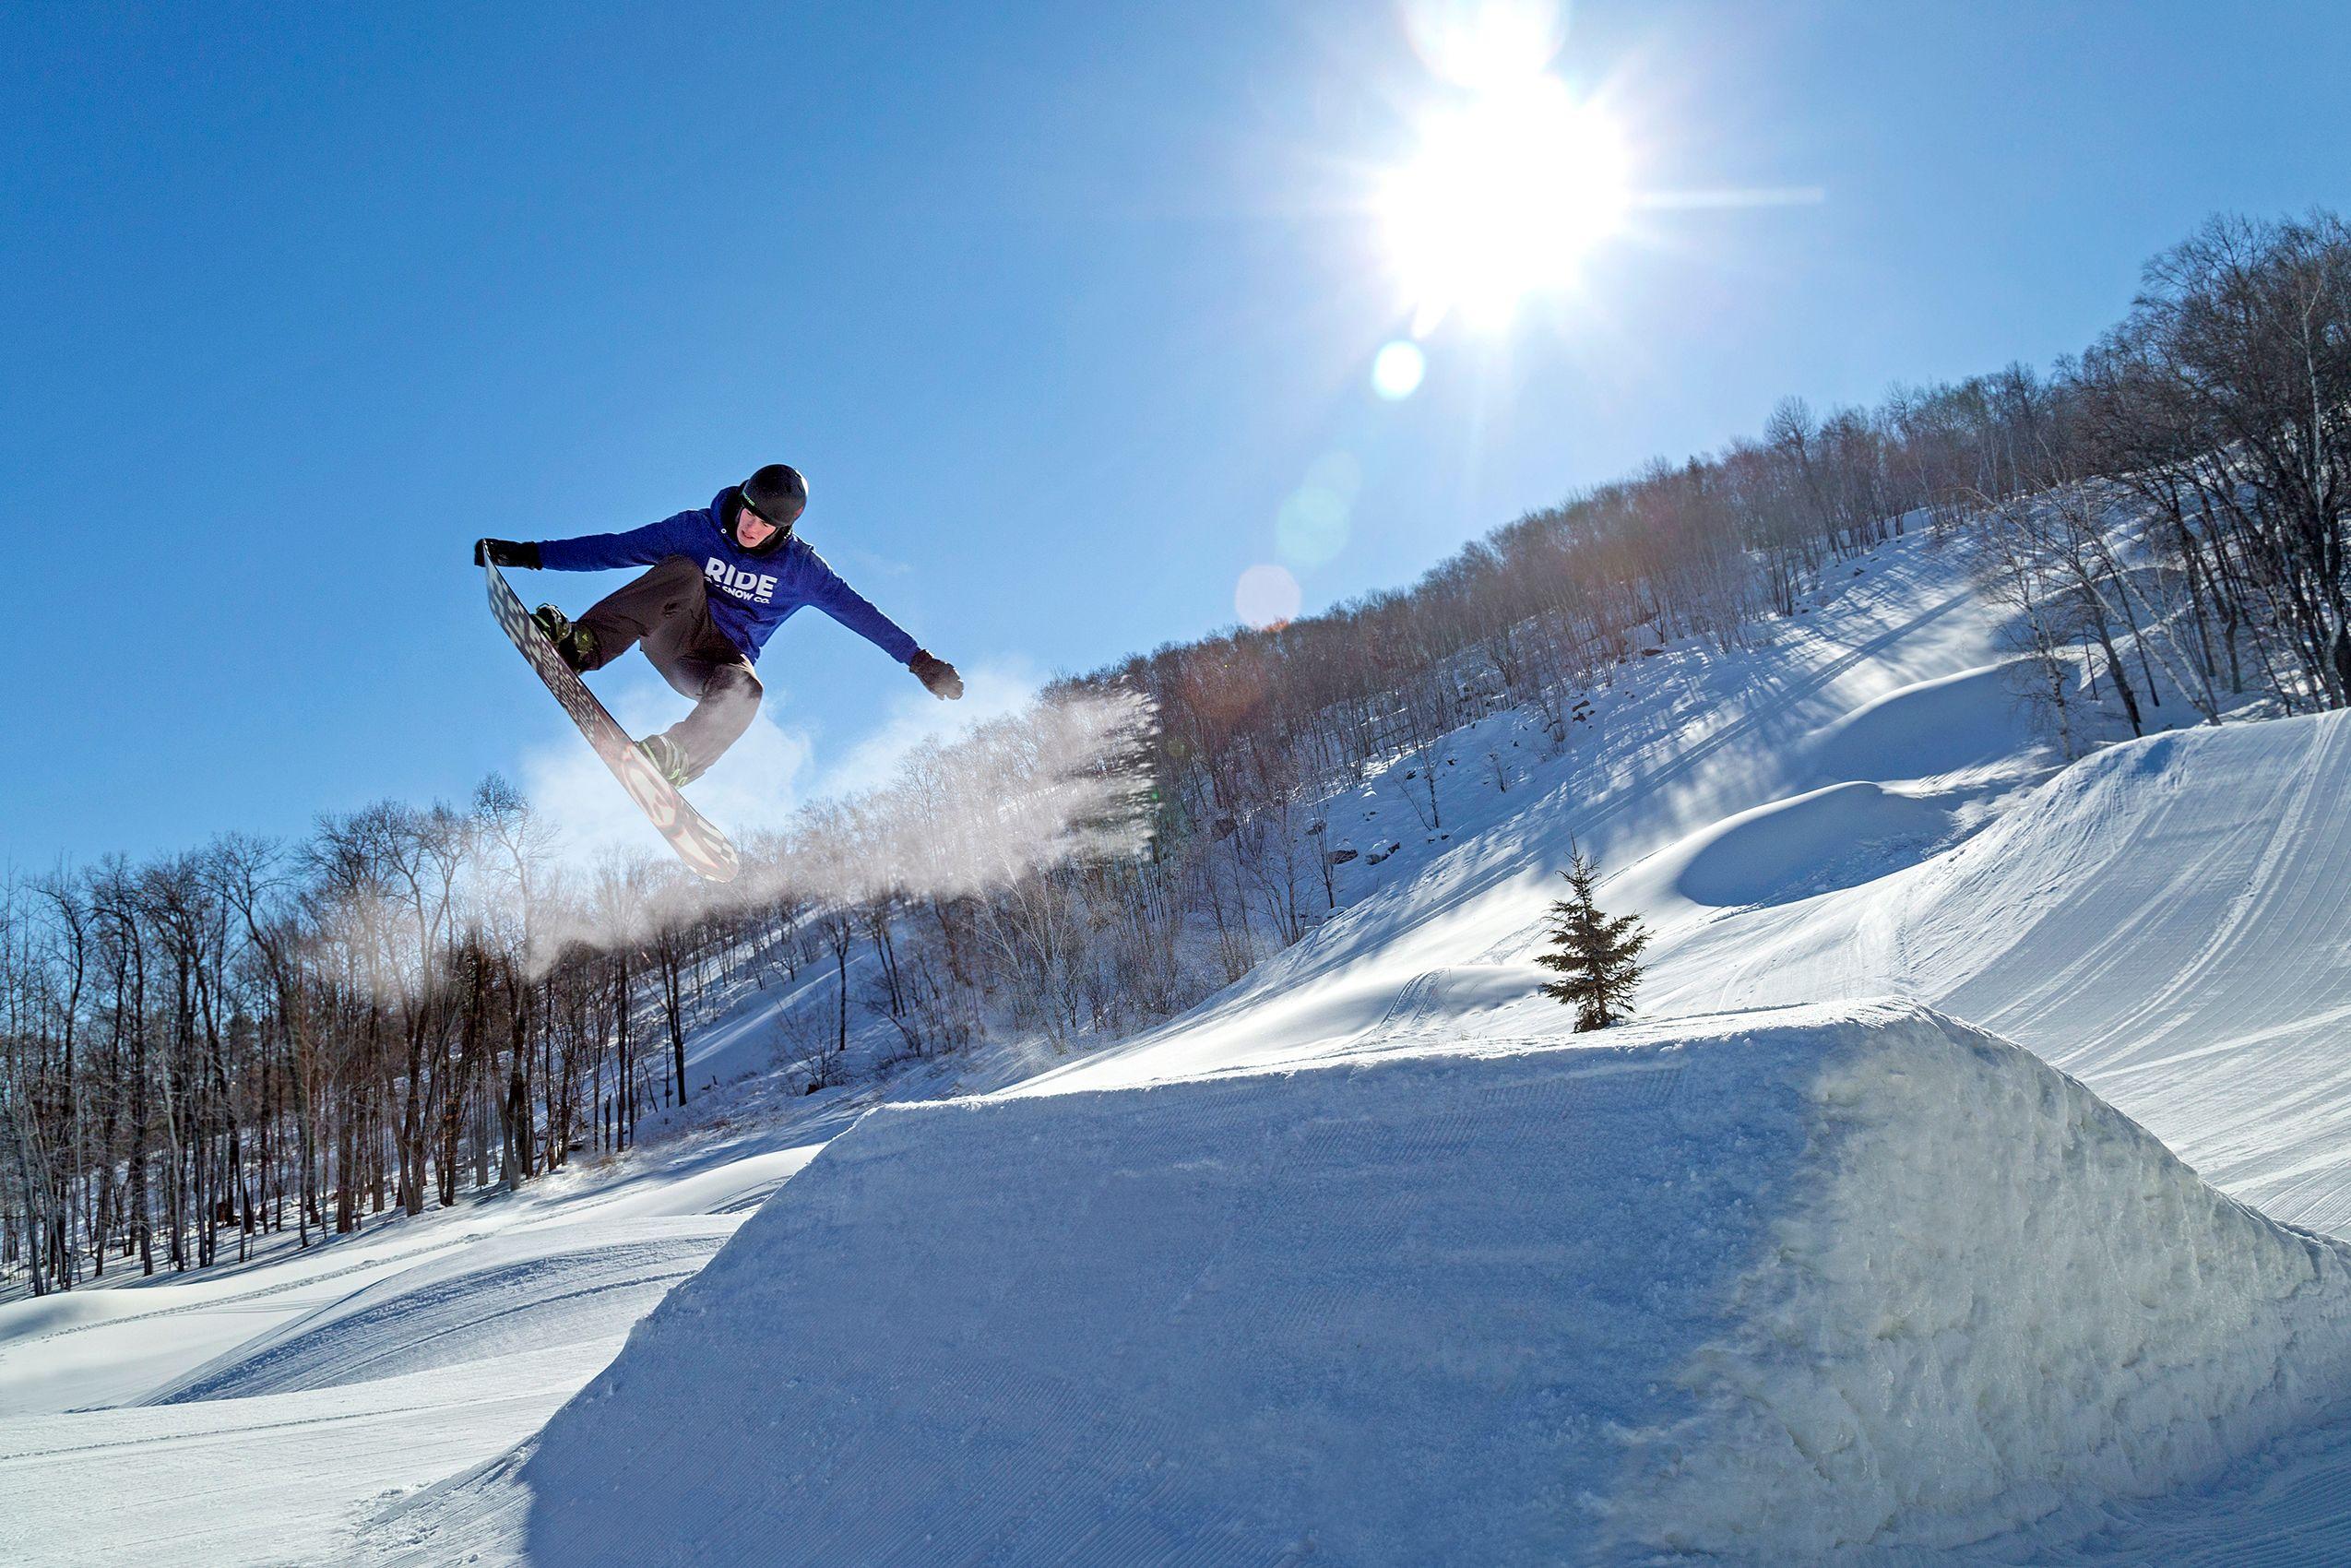 Snowboarding_ARP9715_W.jpg